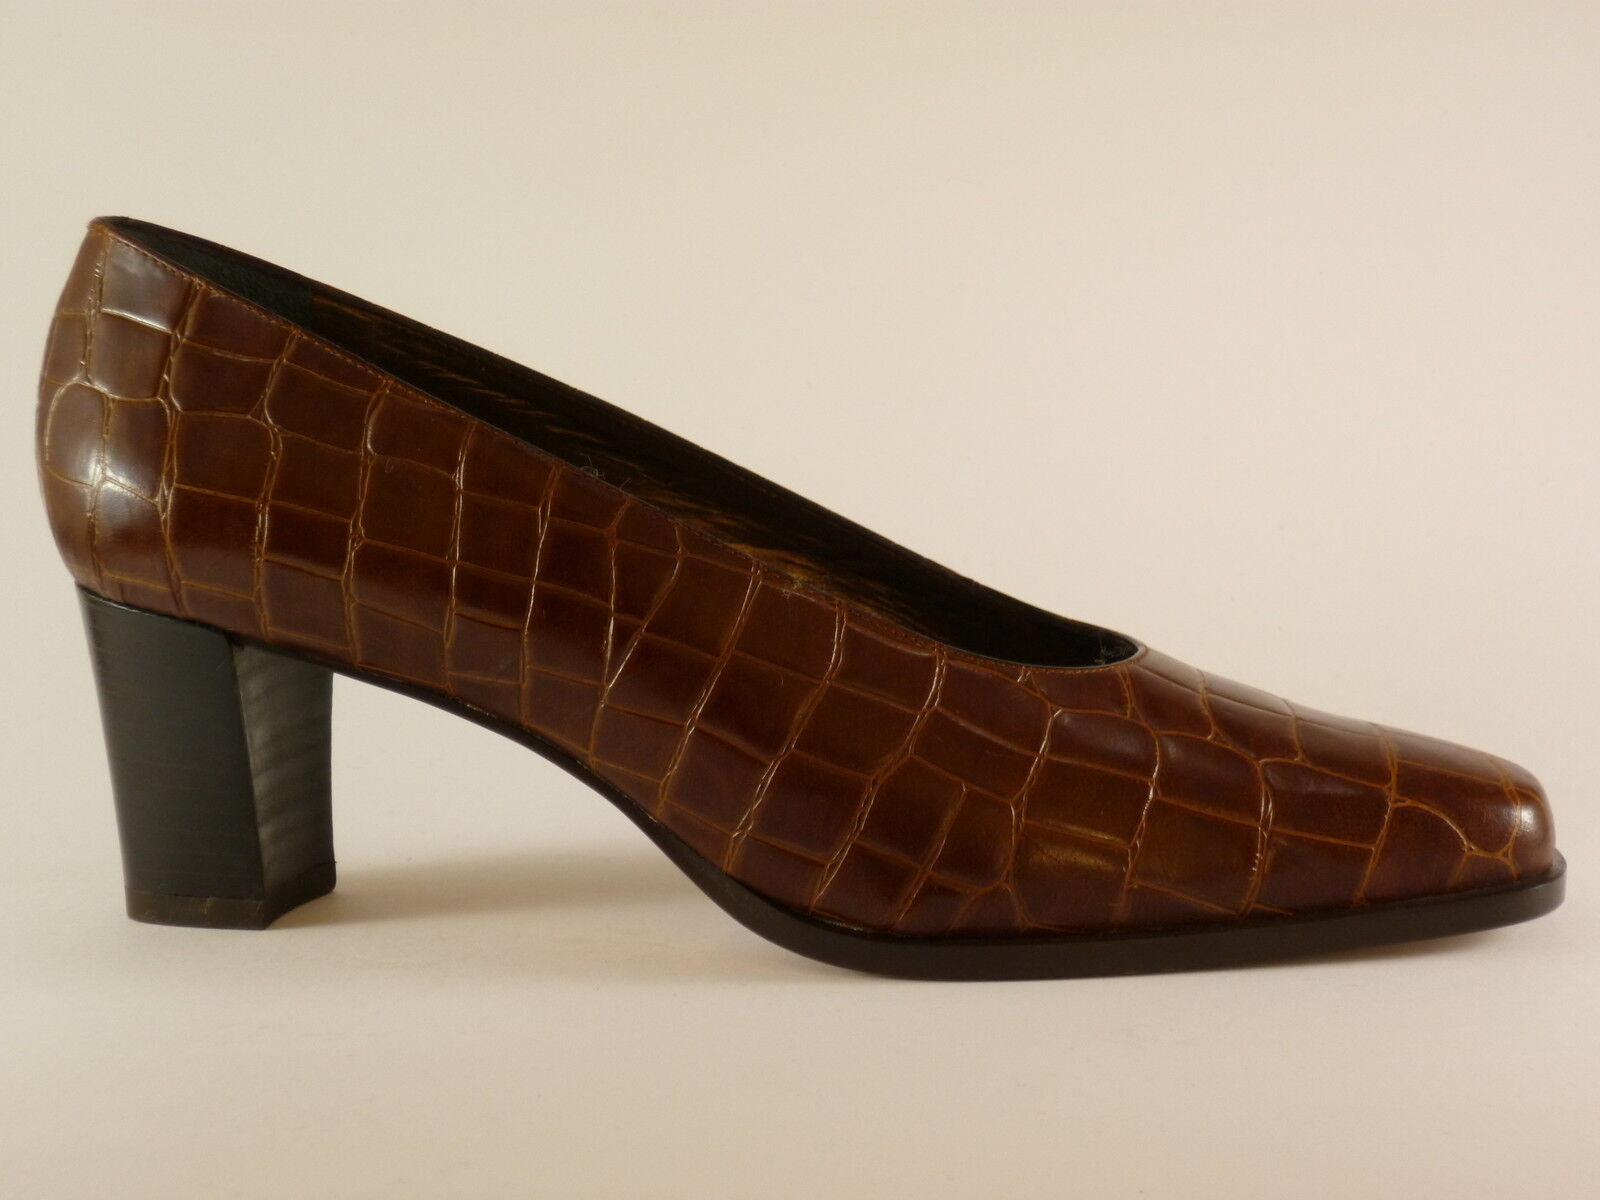 Marcello Giovannetti Chaussures Femmes 41 Cuir Marron de Soirée Escarpins Neuf